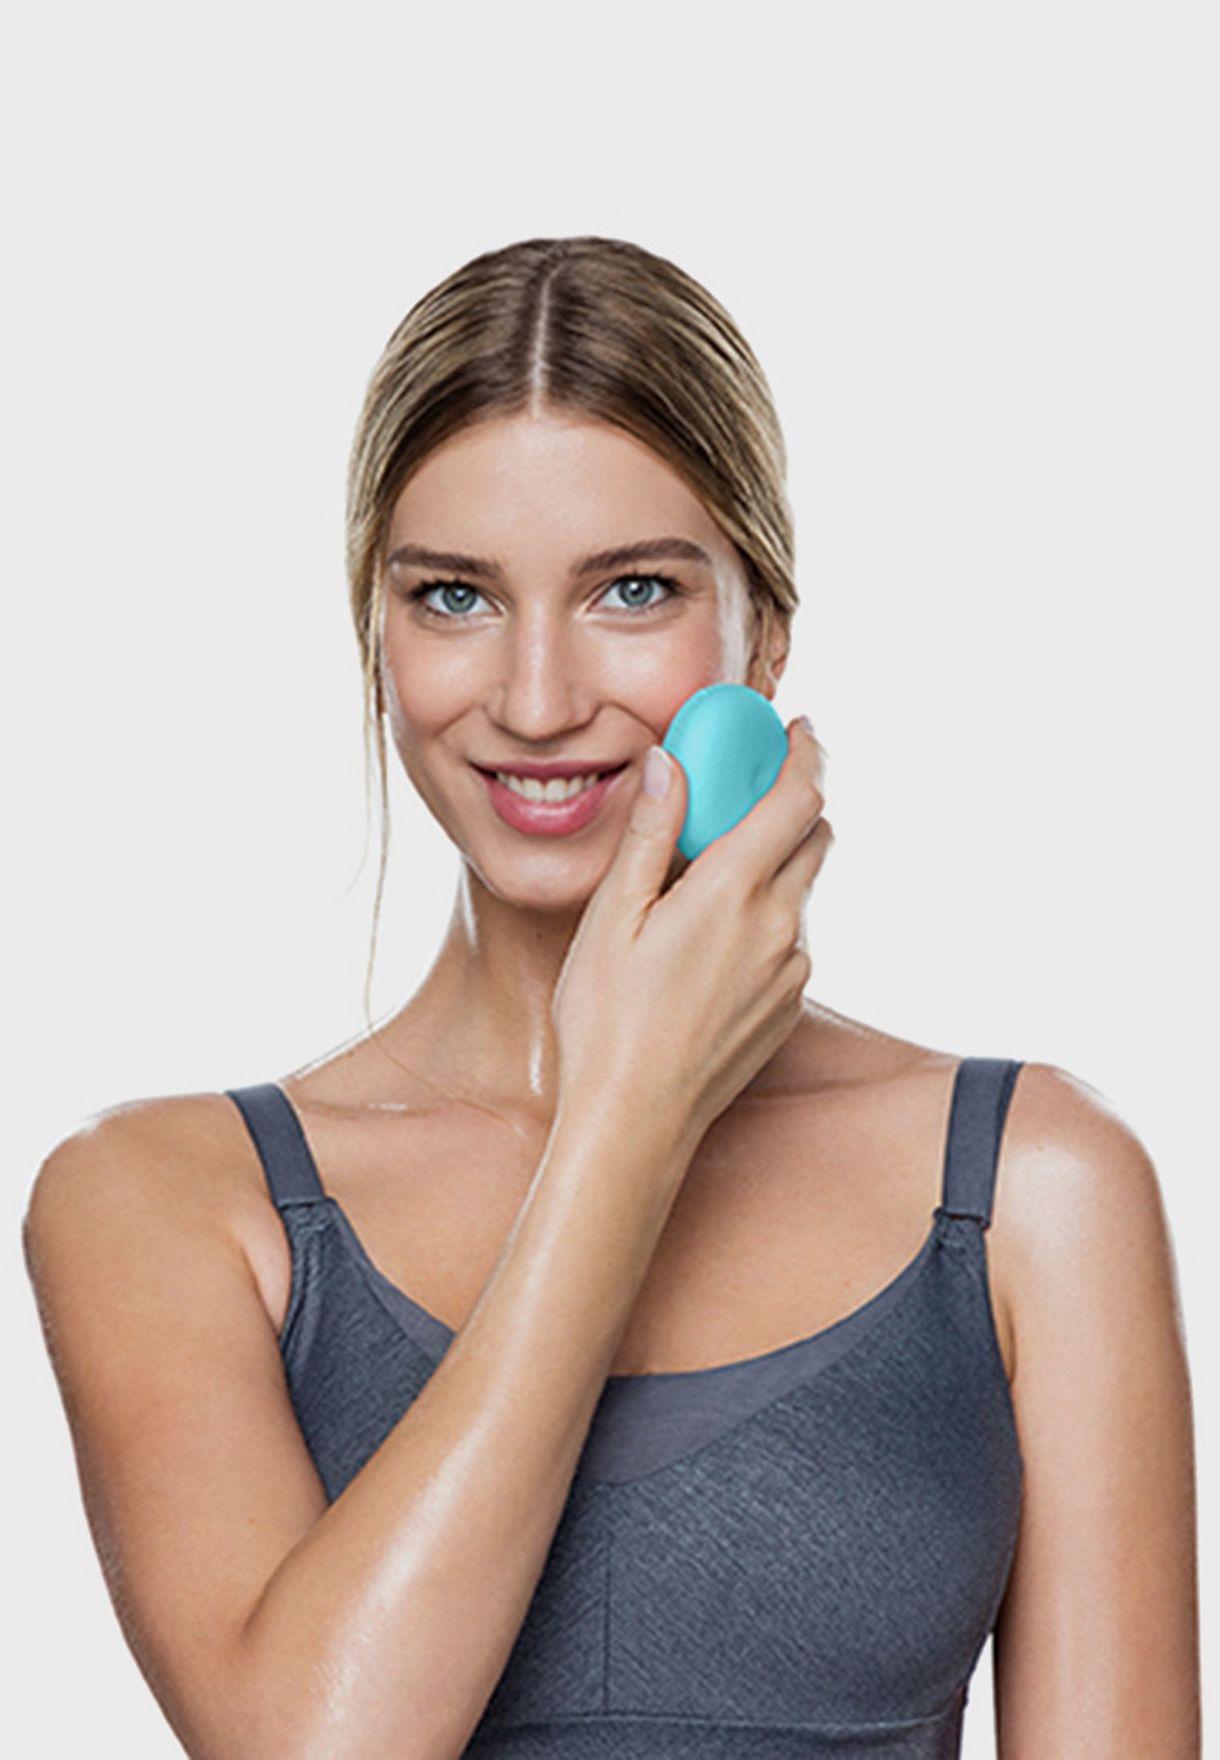 LUNA play plus Facial Cleansing Brush - Mint